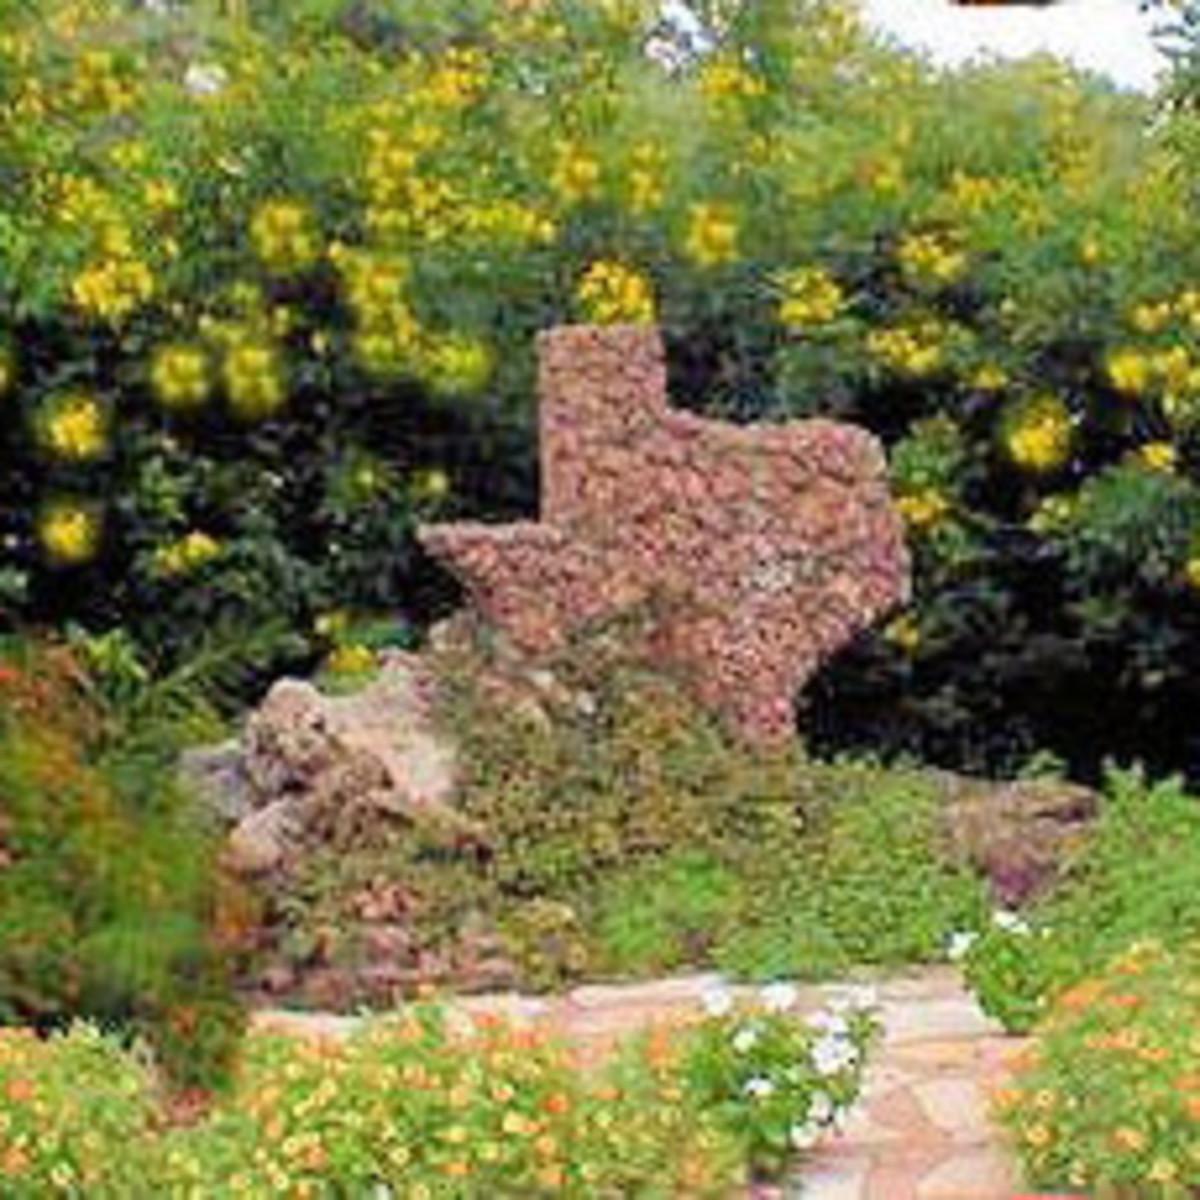 Austin_photo: Places_Outdoors_Zilker Botanical Gardens_flowers